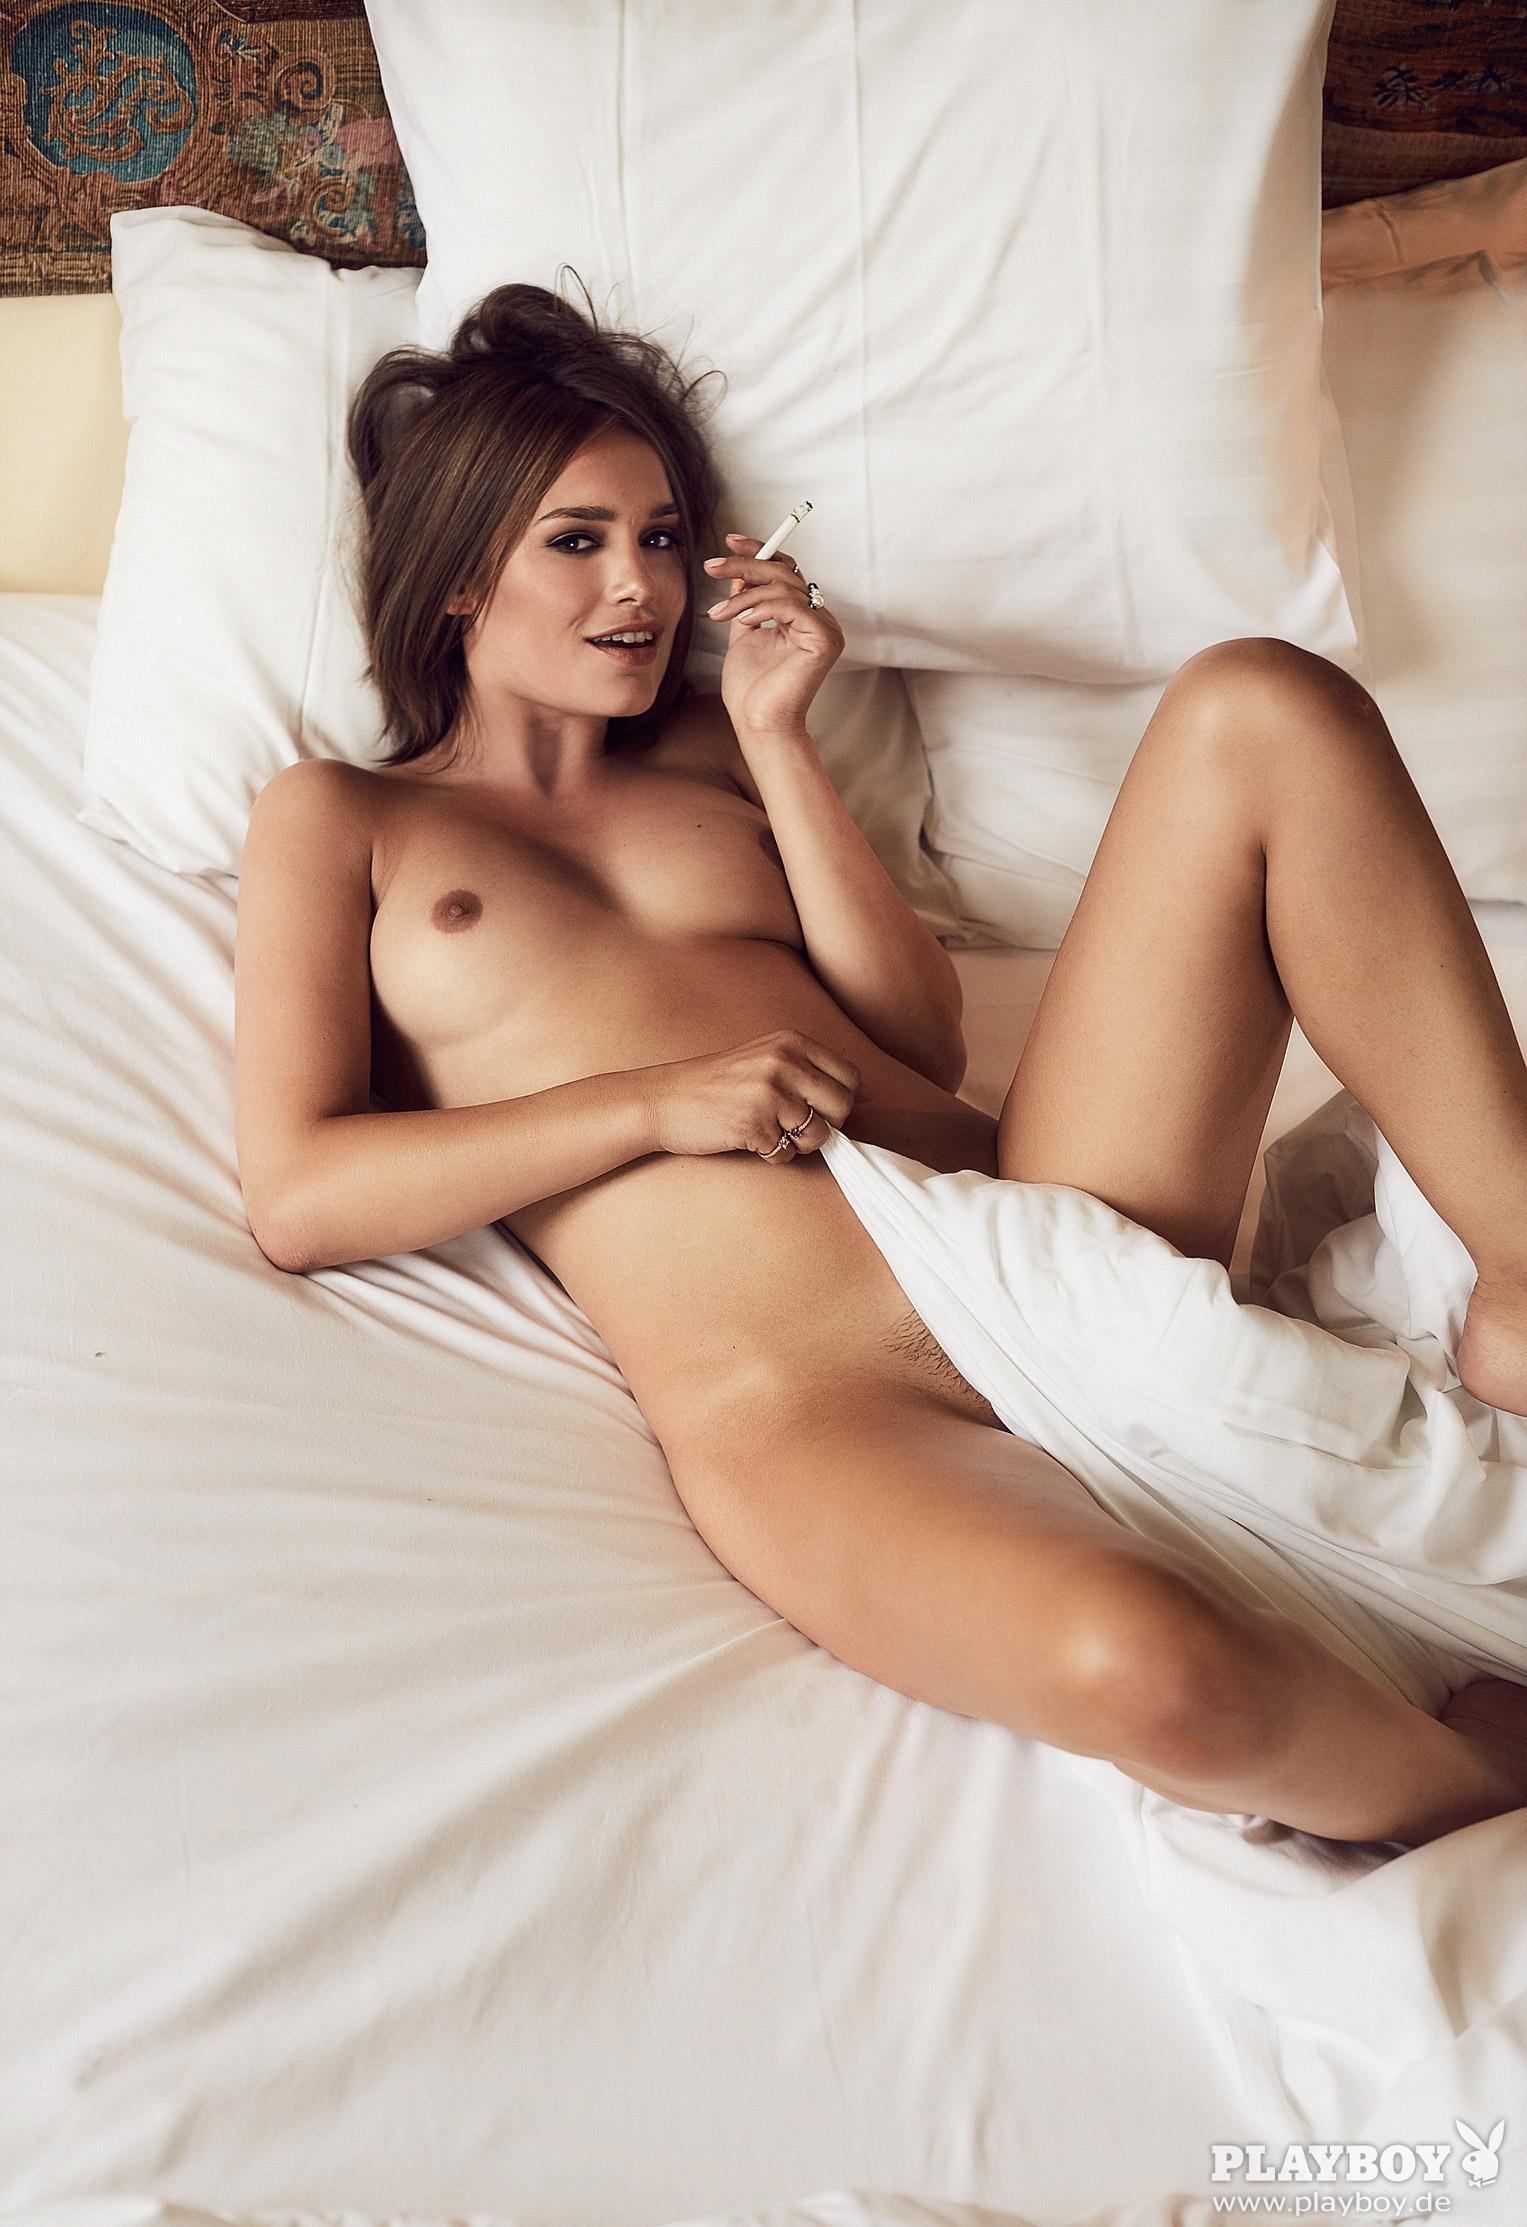 Девушка месяца Сабина Тут / Sabina Toet - Miss Januar 2018 / Playboy Germany